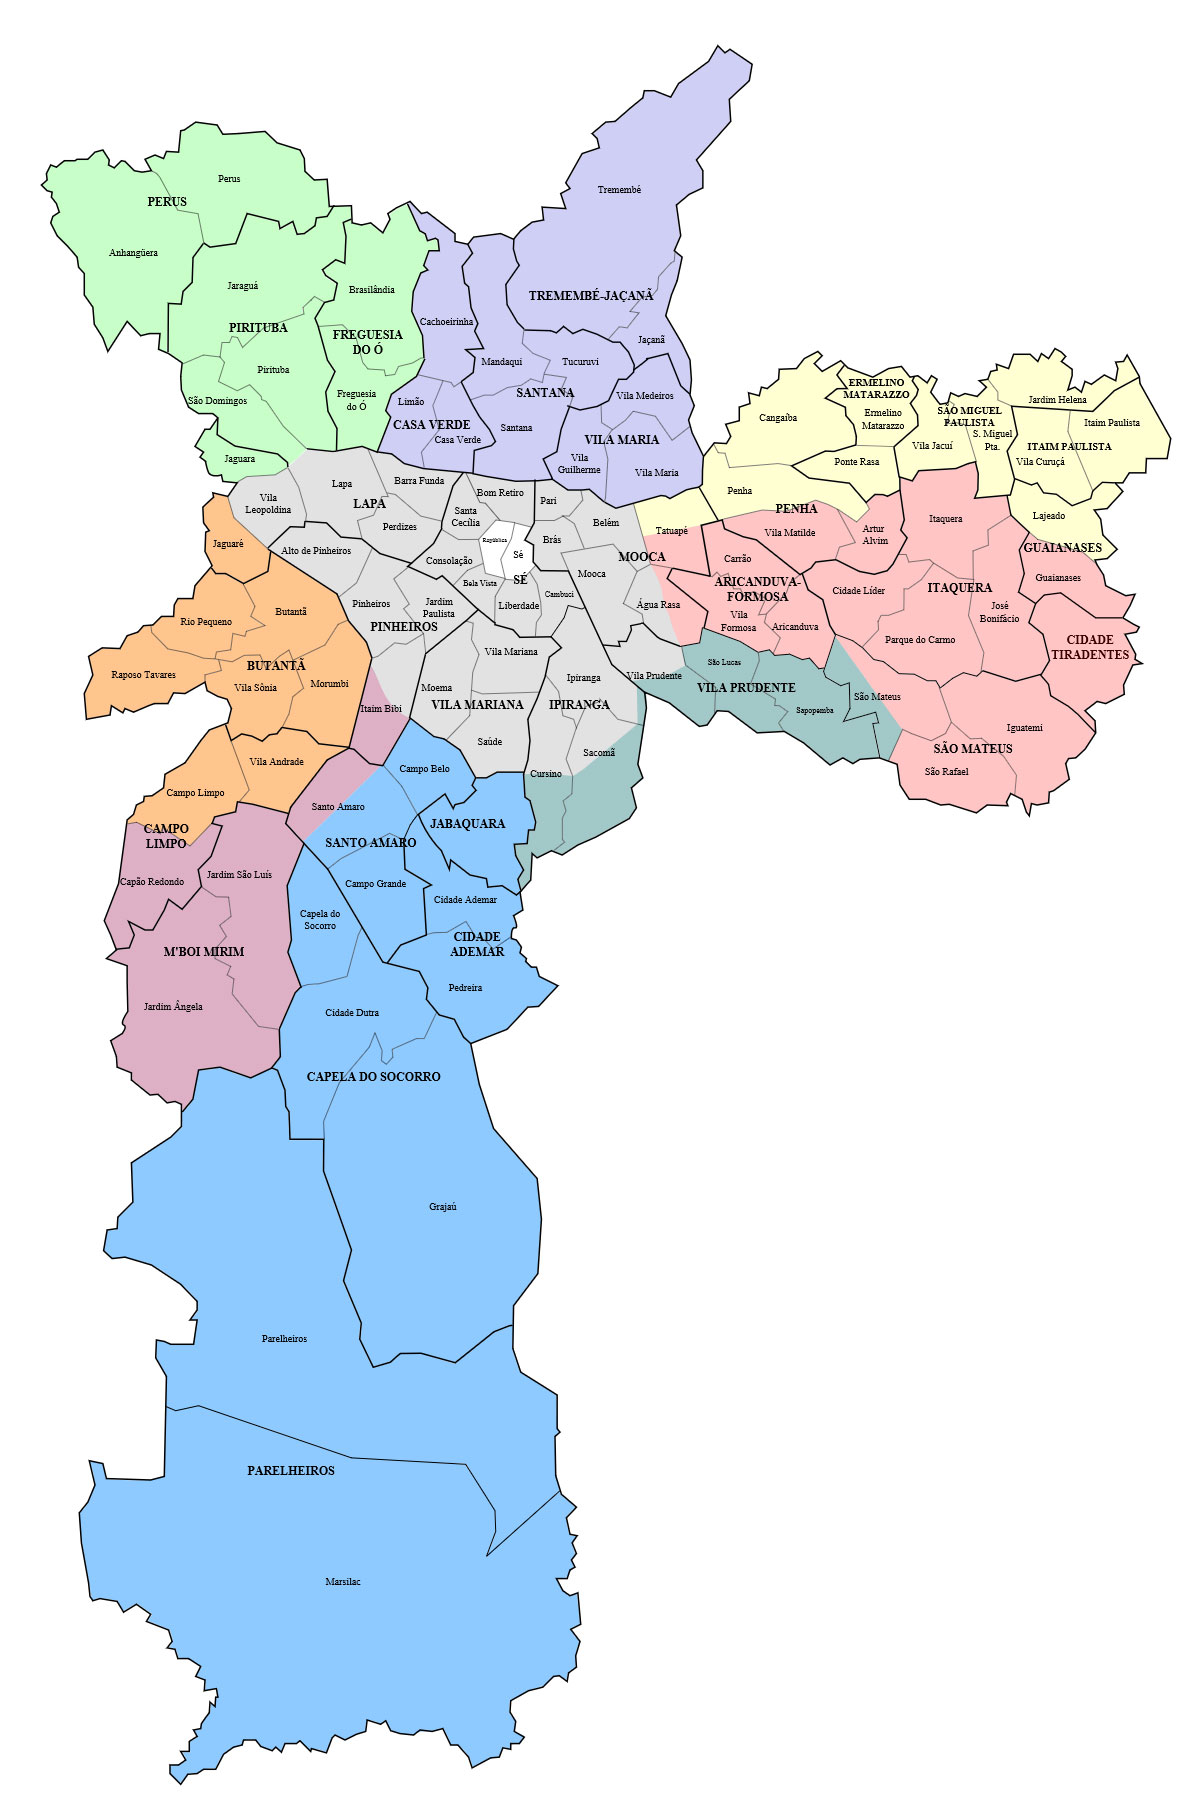 mapa_bairros_sao_paulo